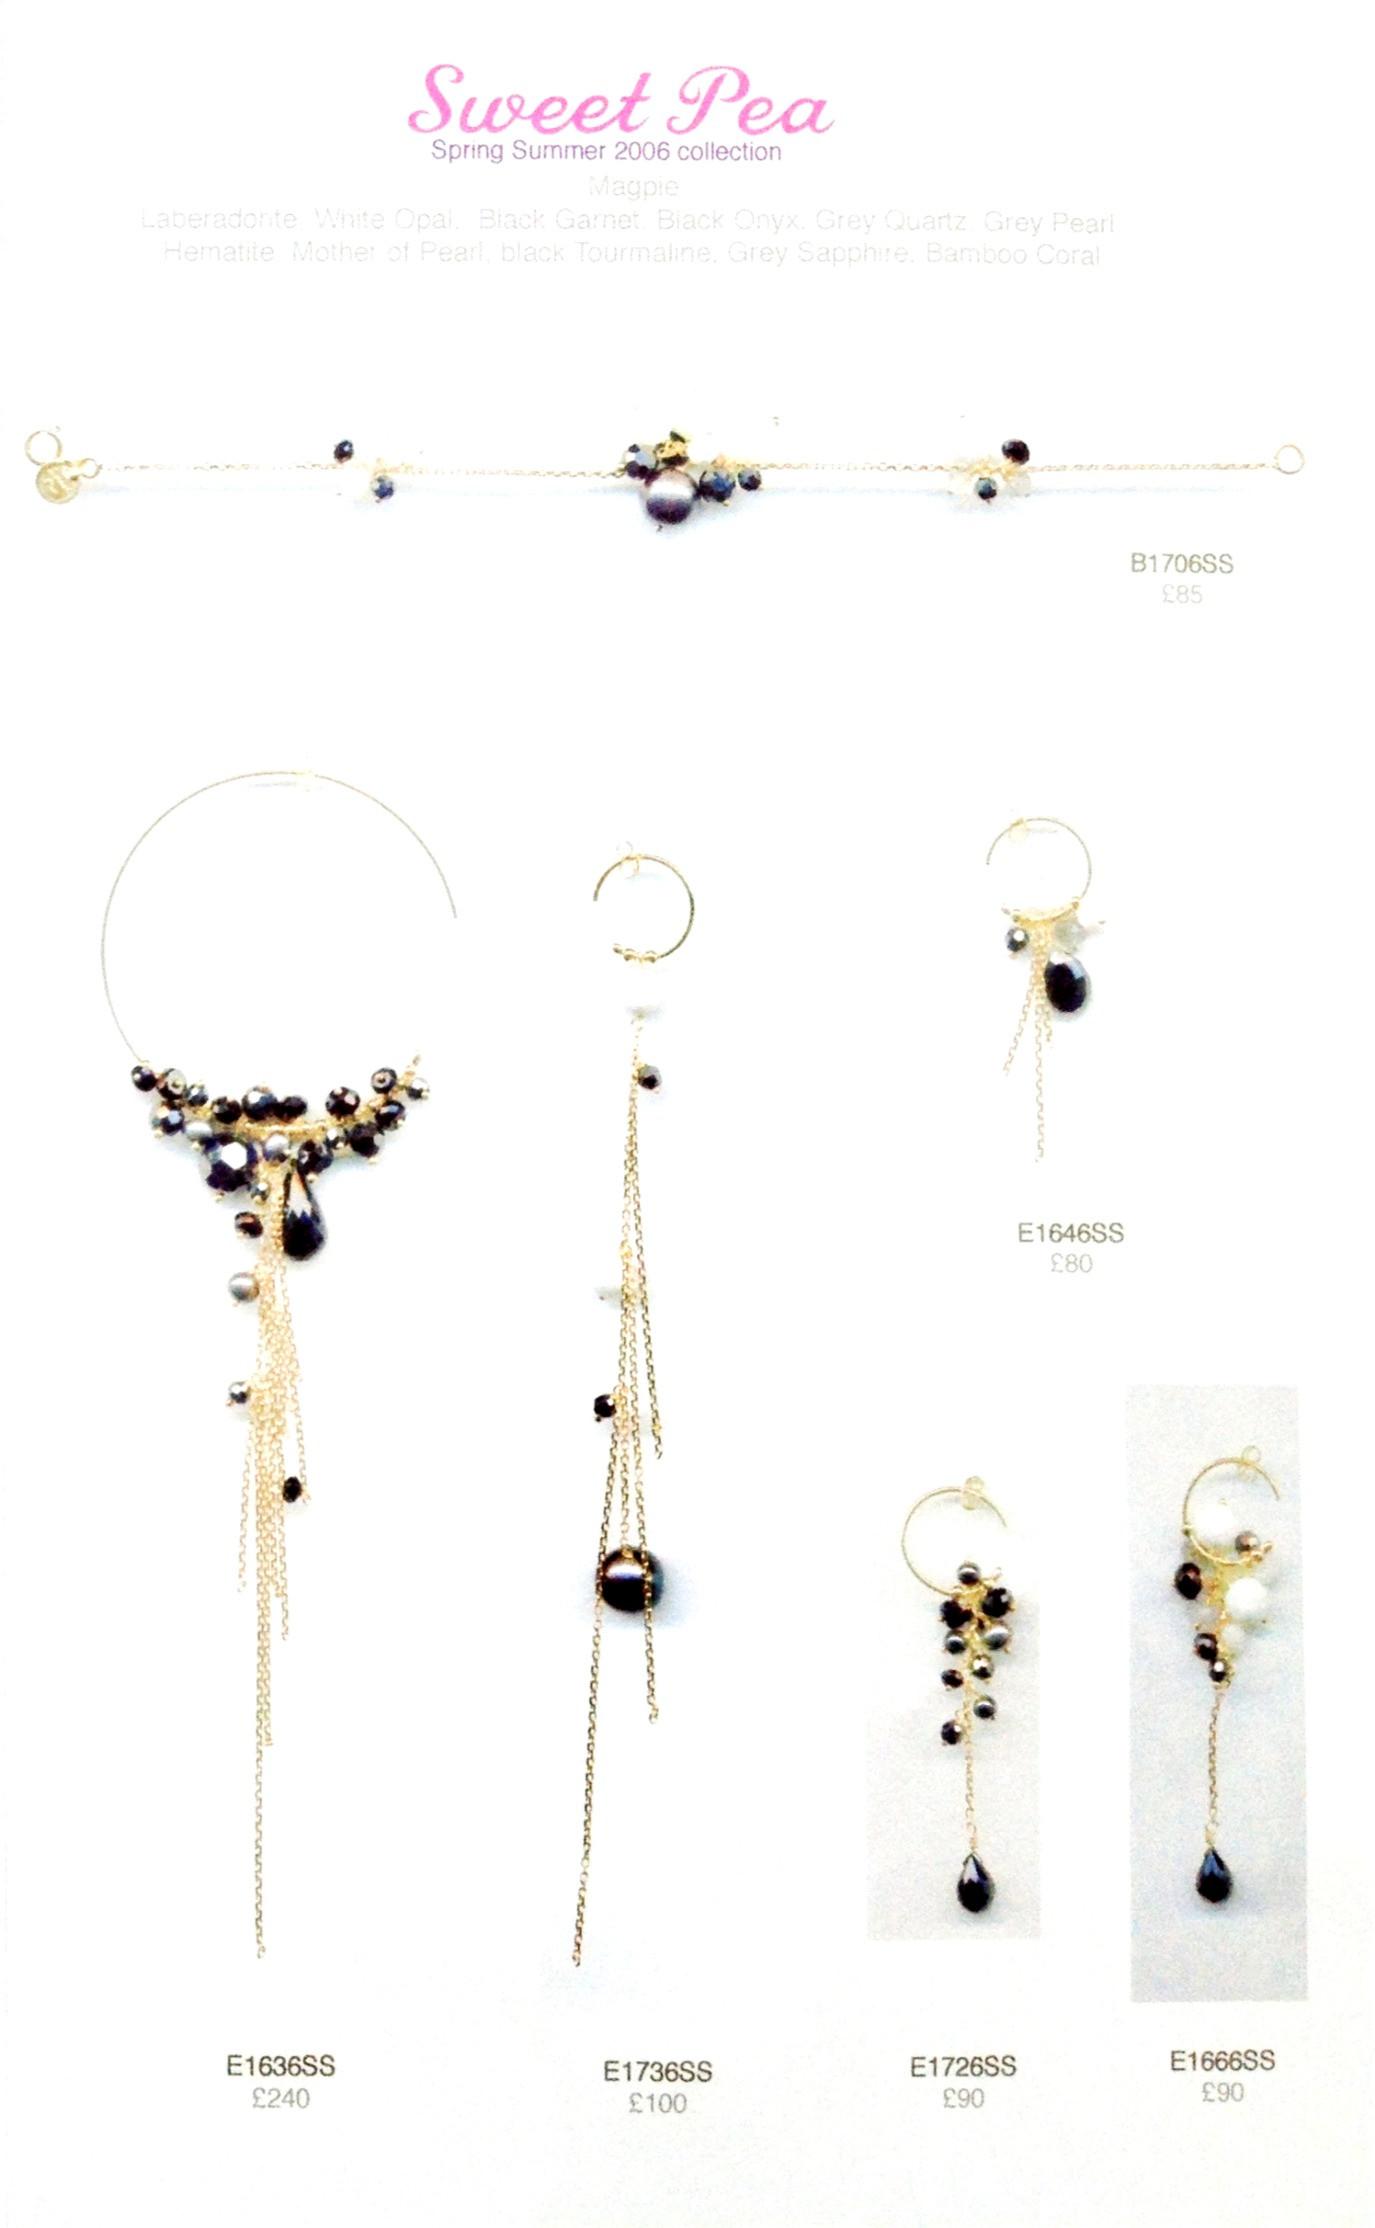 Jewellery design for sweetpea